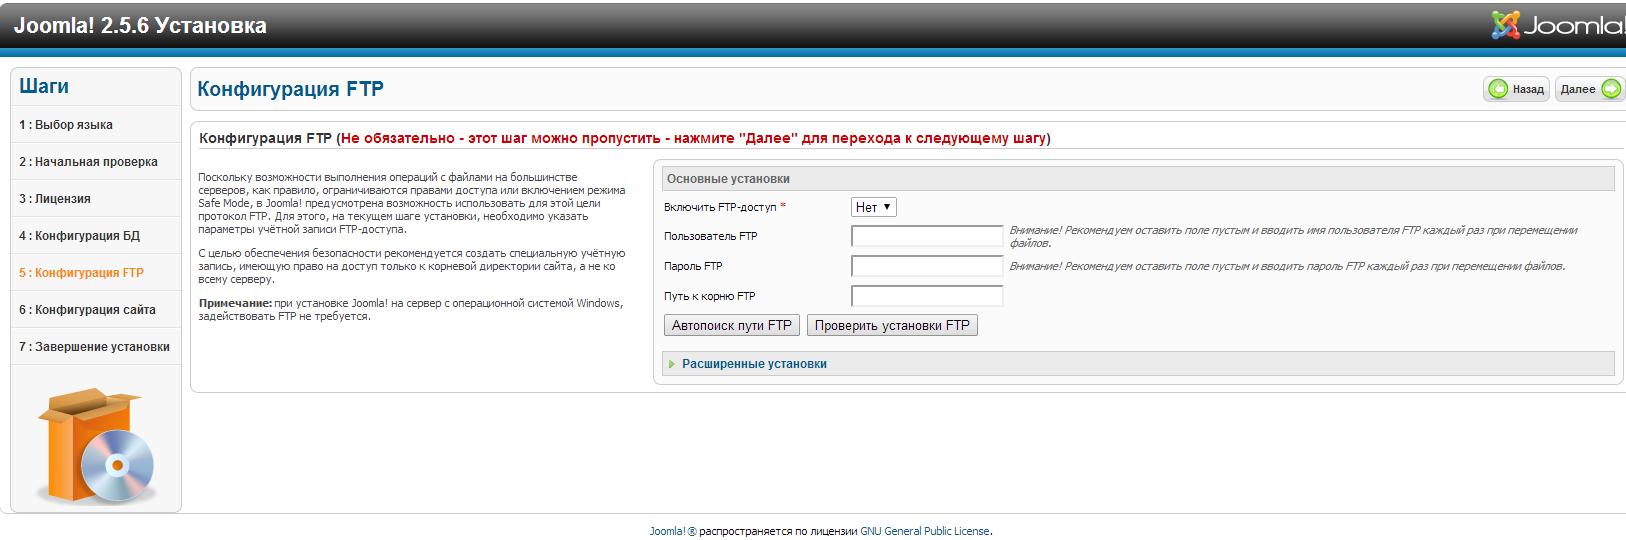 Конфигурация FTP - Joomla